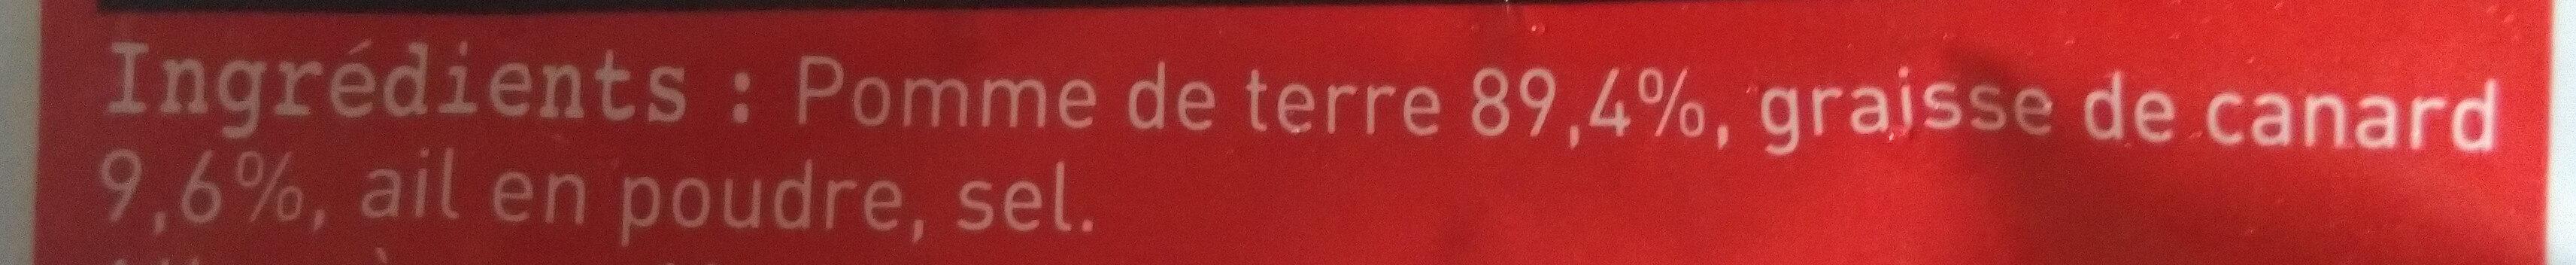 Rissolées du sud ouest - Ingrediënten - fr